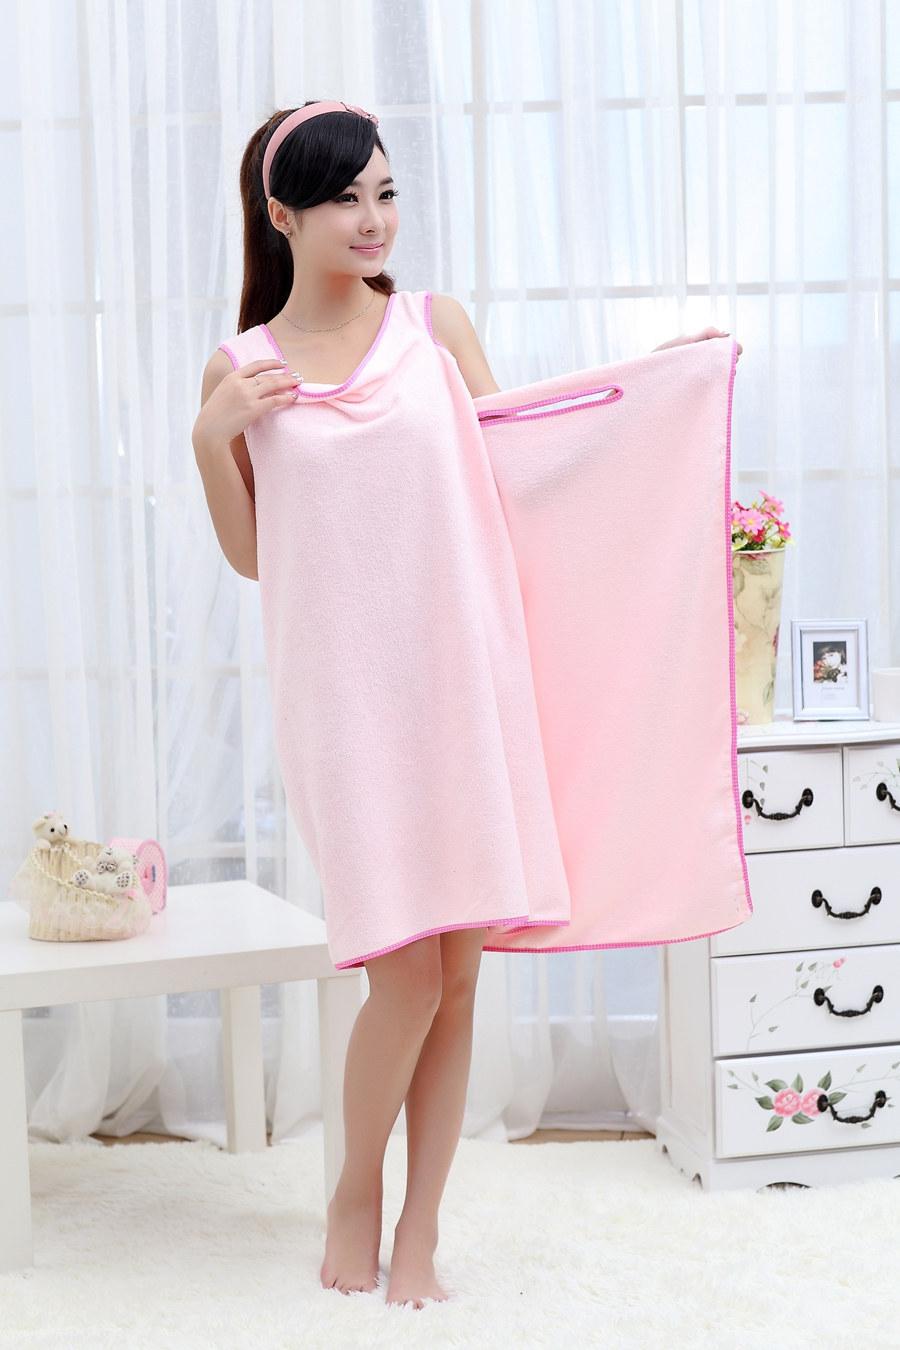 Unisex Microfiber Wearable Towel Bathrobe Spa Fast Dry Washclothing Wrap Towel Bath Dress Pink(China (Mainland))